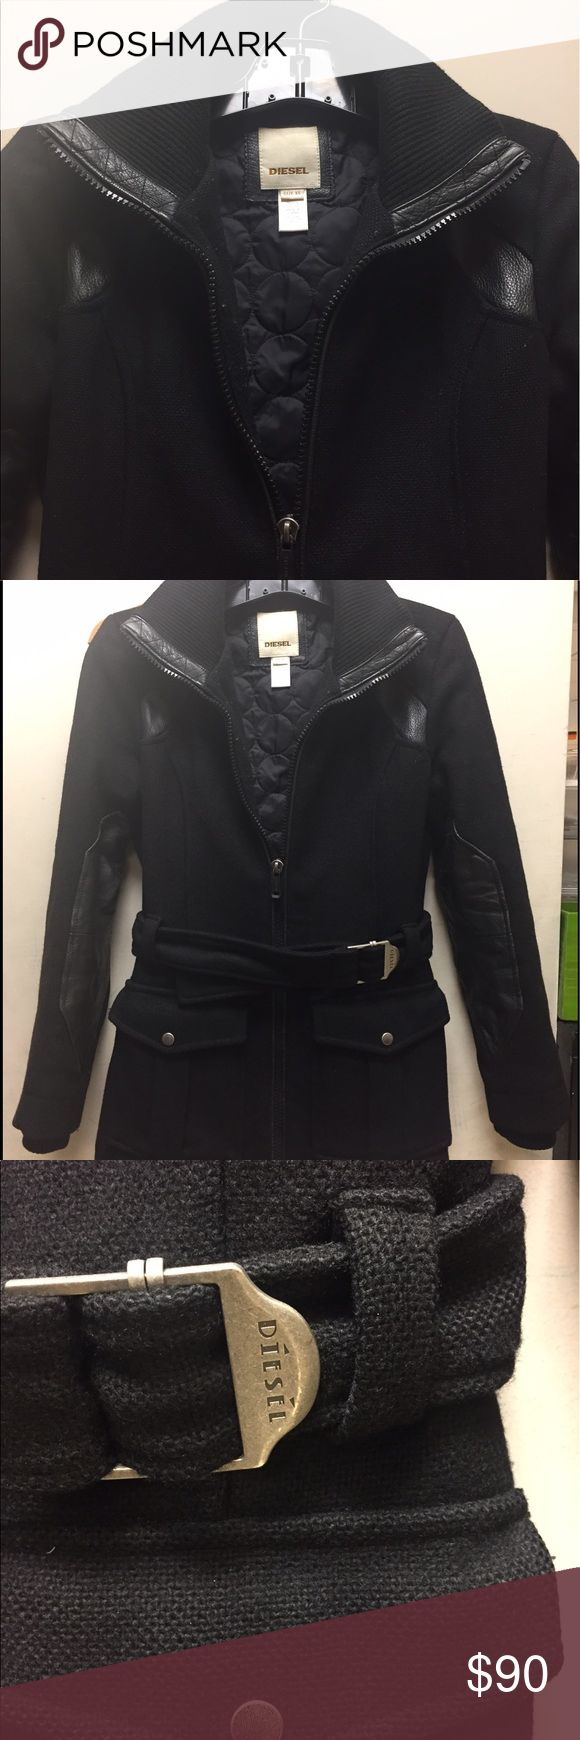 DIESEL COAT Black wool w/ leather patches coat Diesel Jackets & Coats Pea Coats